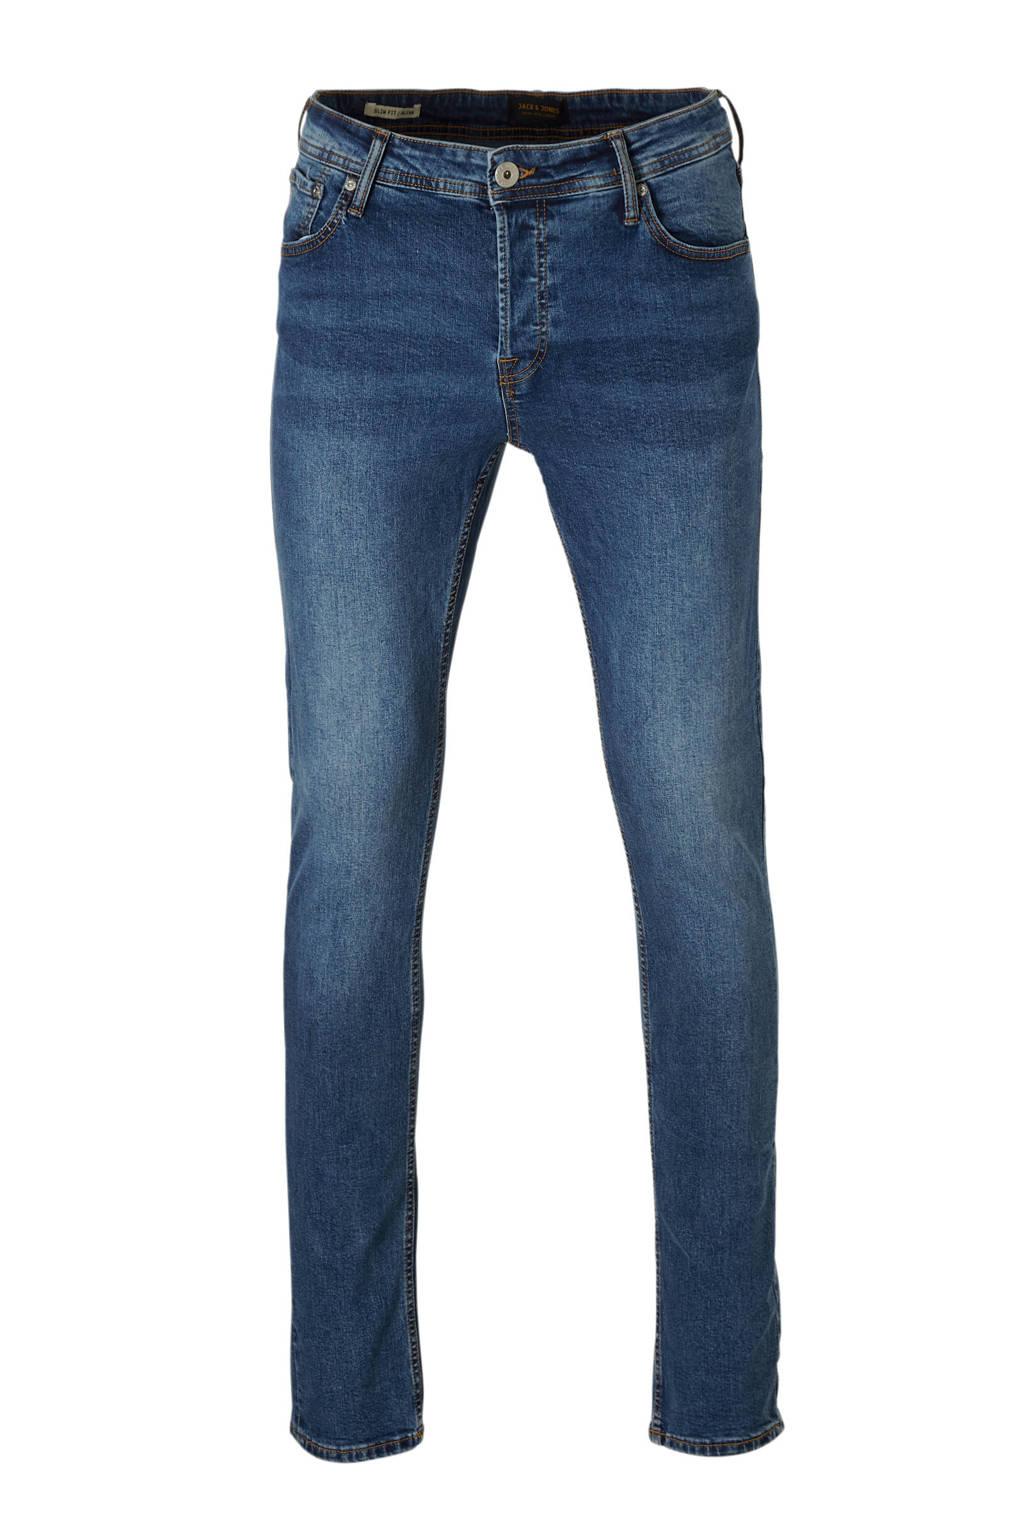 Jack & Jones Essentials slim fit jeans, 005 Blue Denim